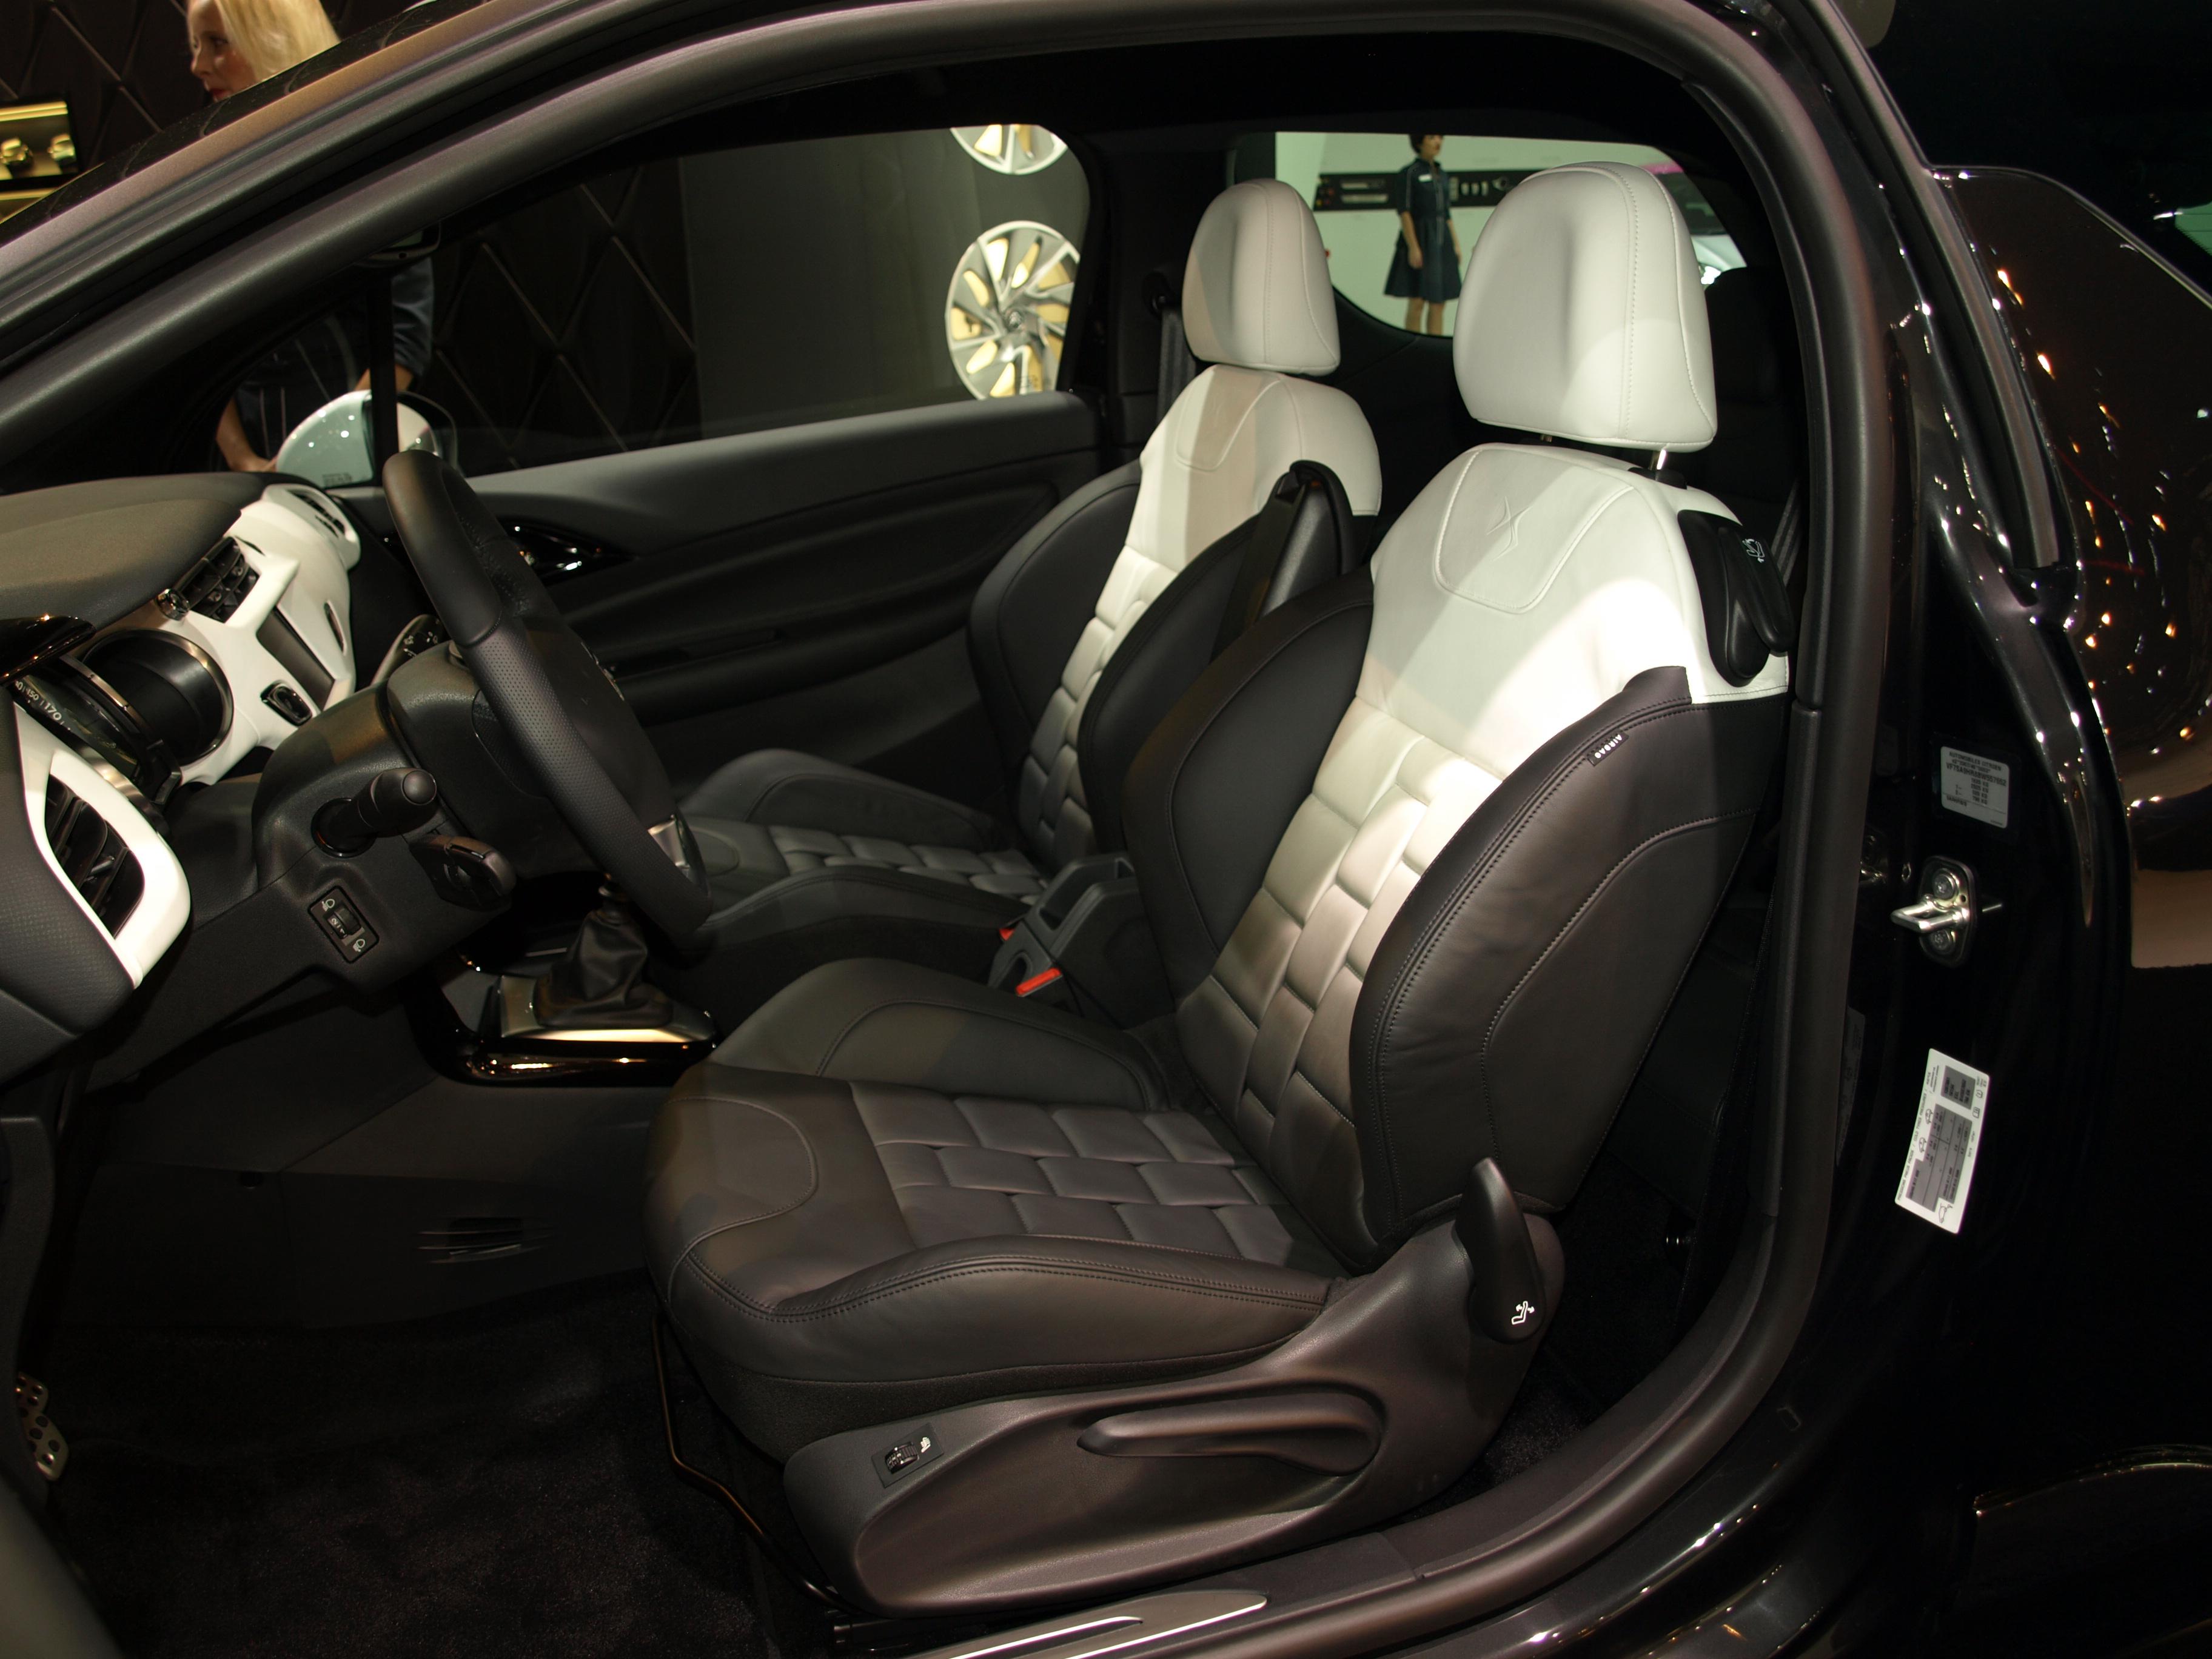 salon de francfort 2011 citro n ds3 ultra prestige fauteuil club. Black Bedroom Furniture Sets. Home Design Ideas